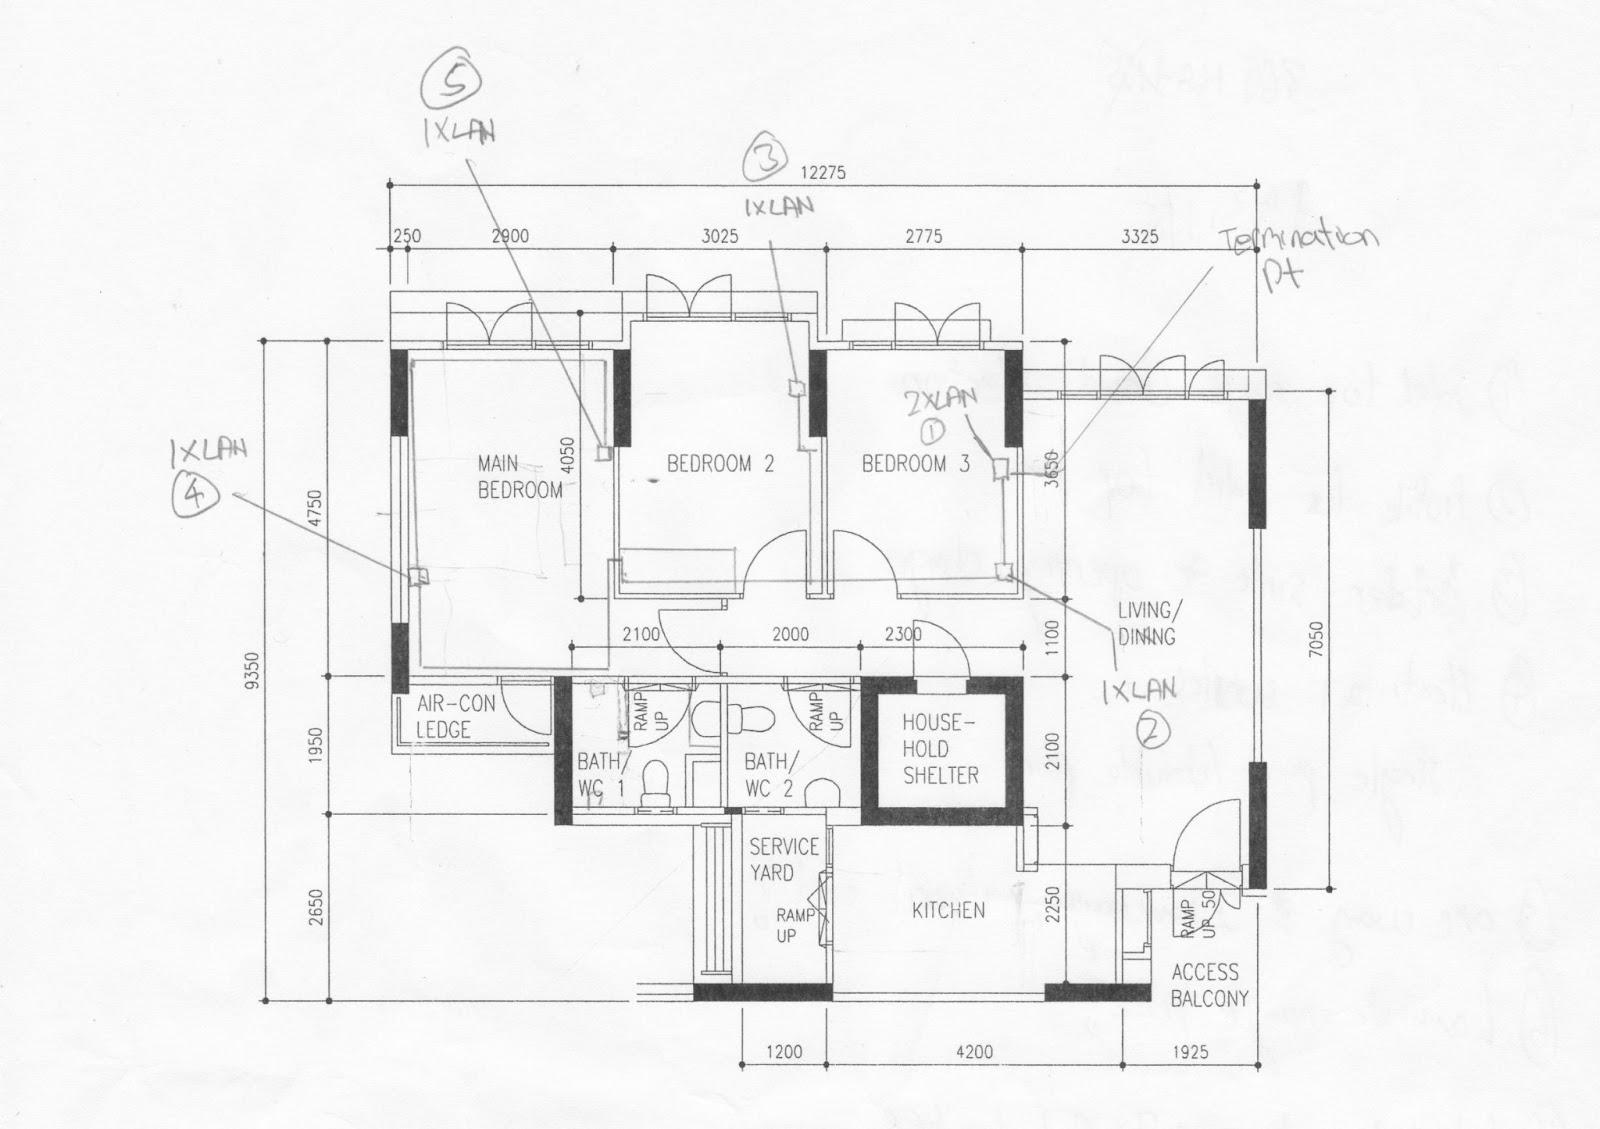 rj45 layout